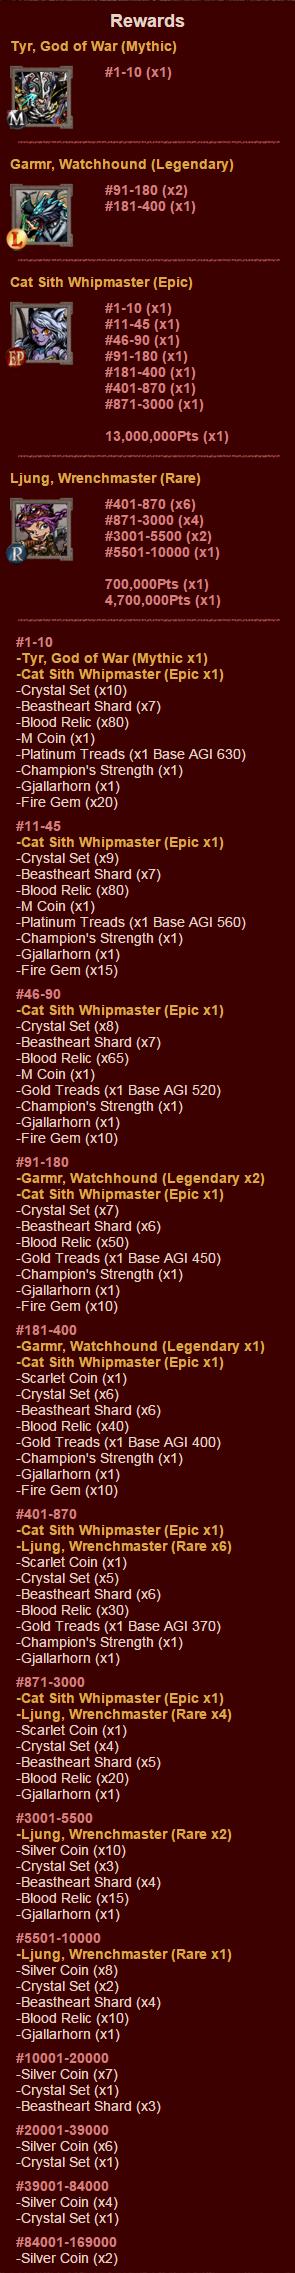 GoS39 Rewards